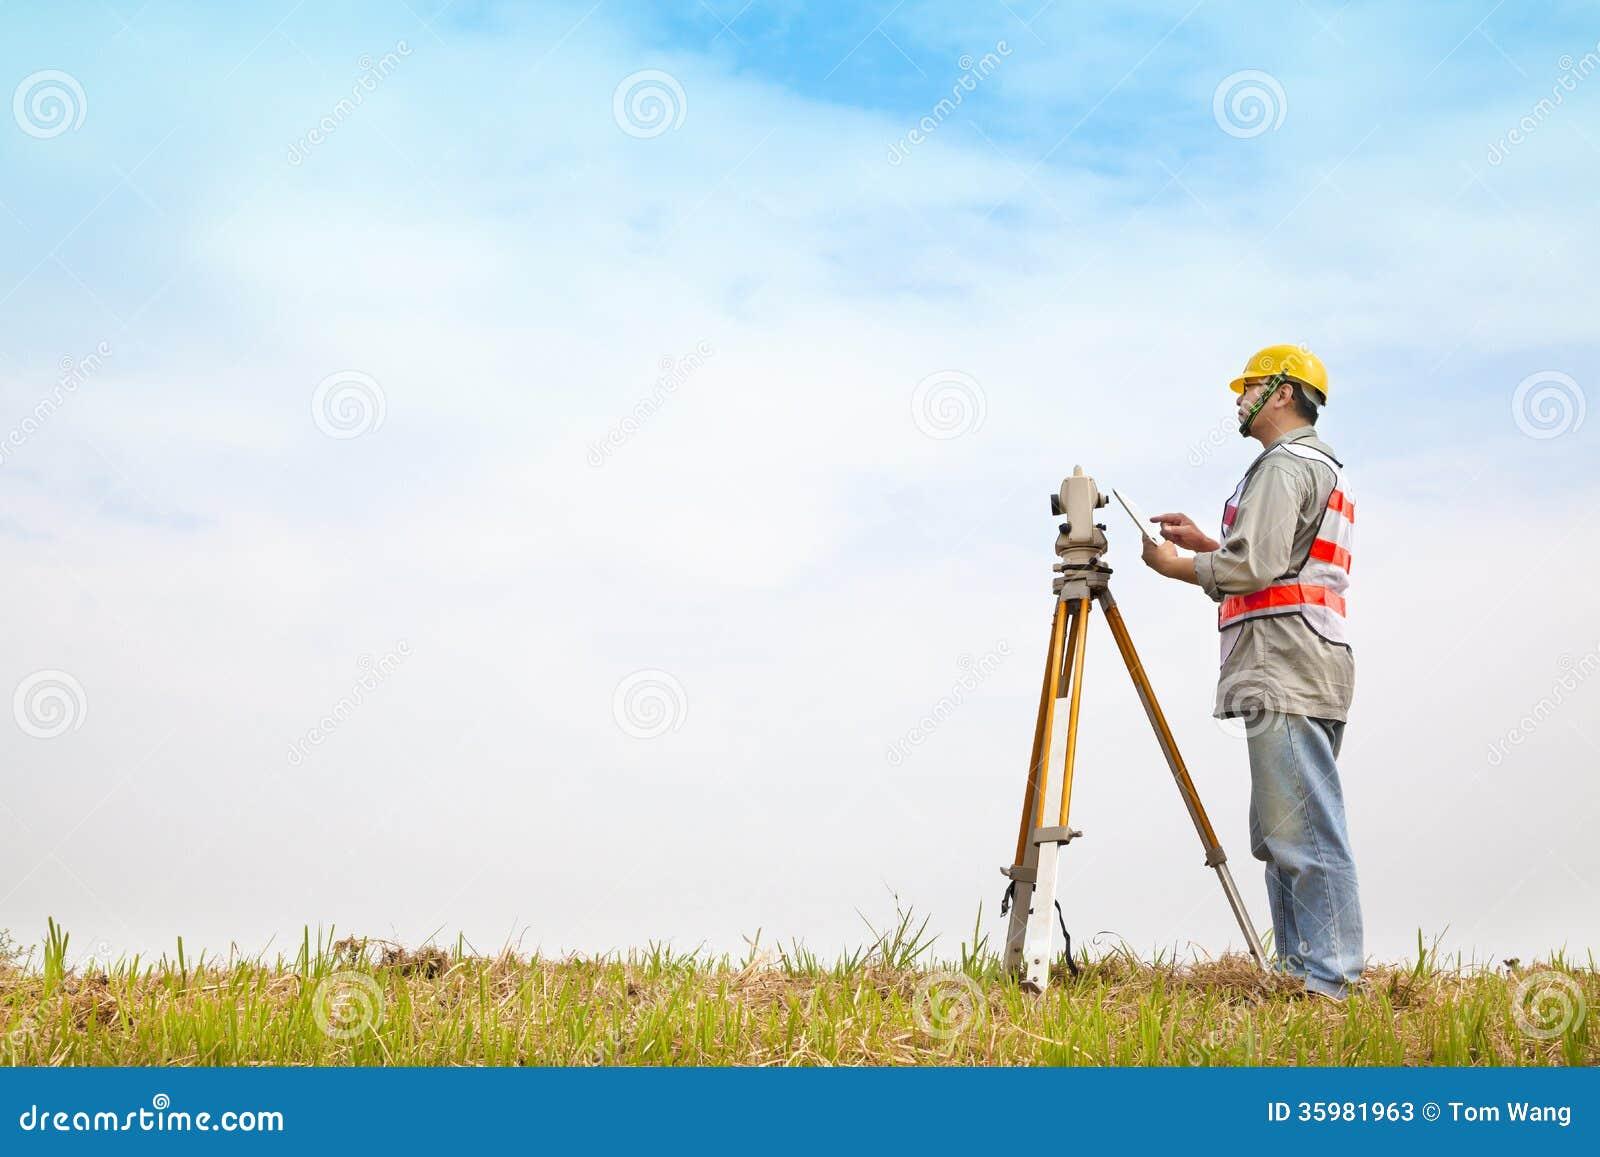 ski field survey essay